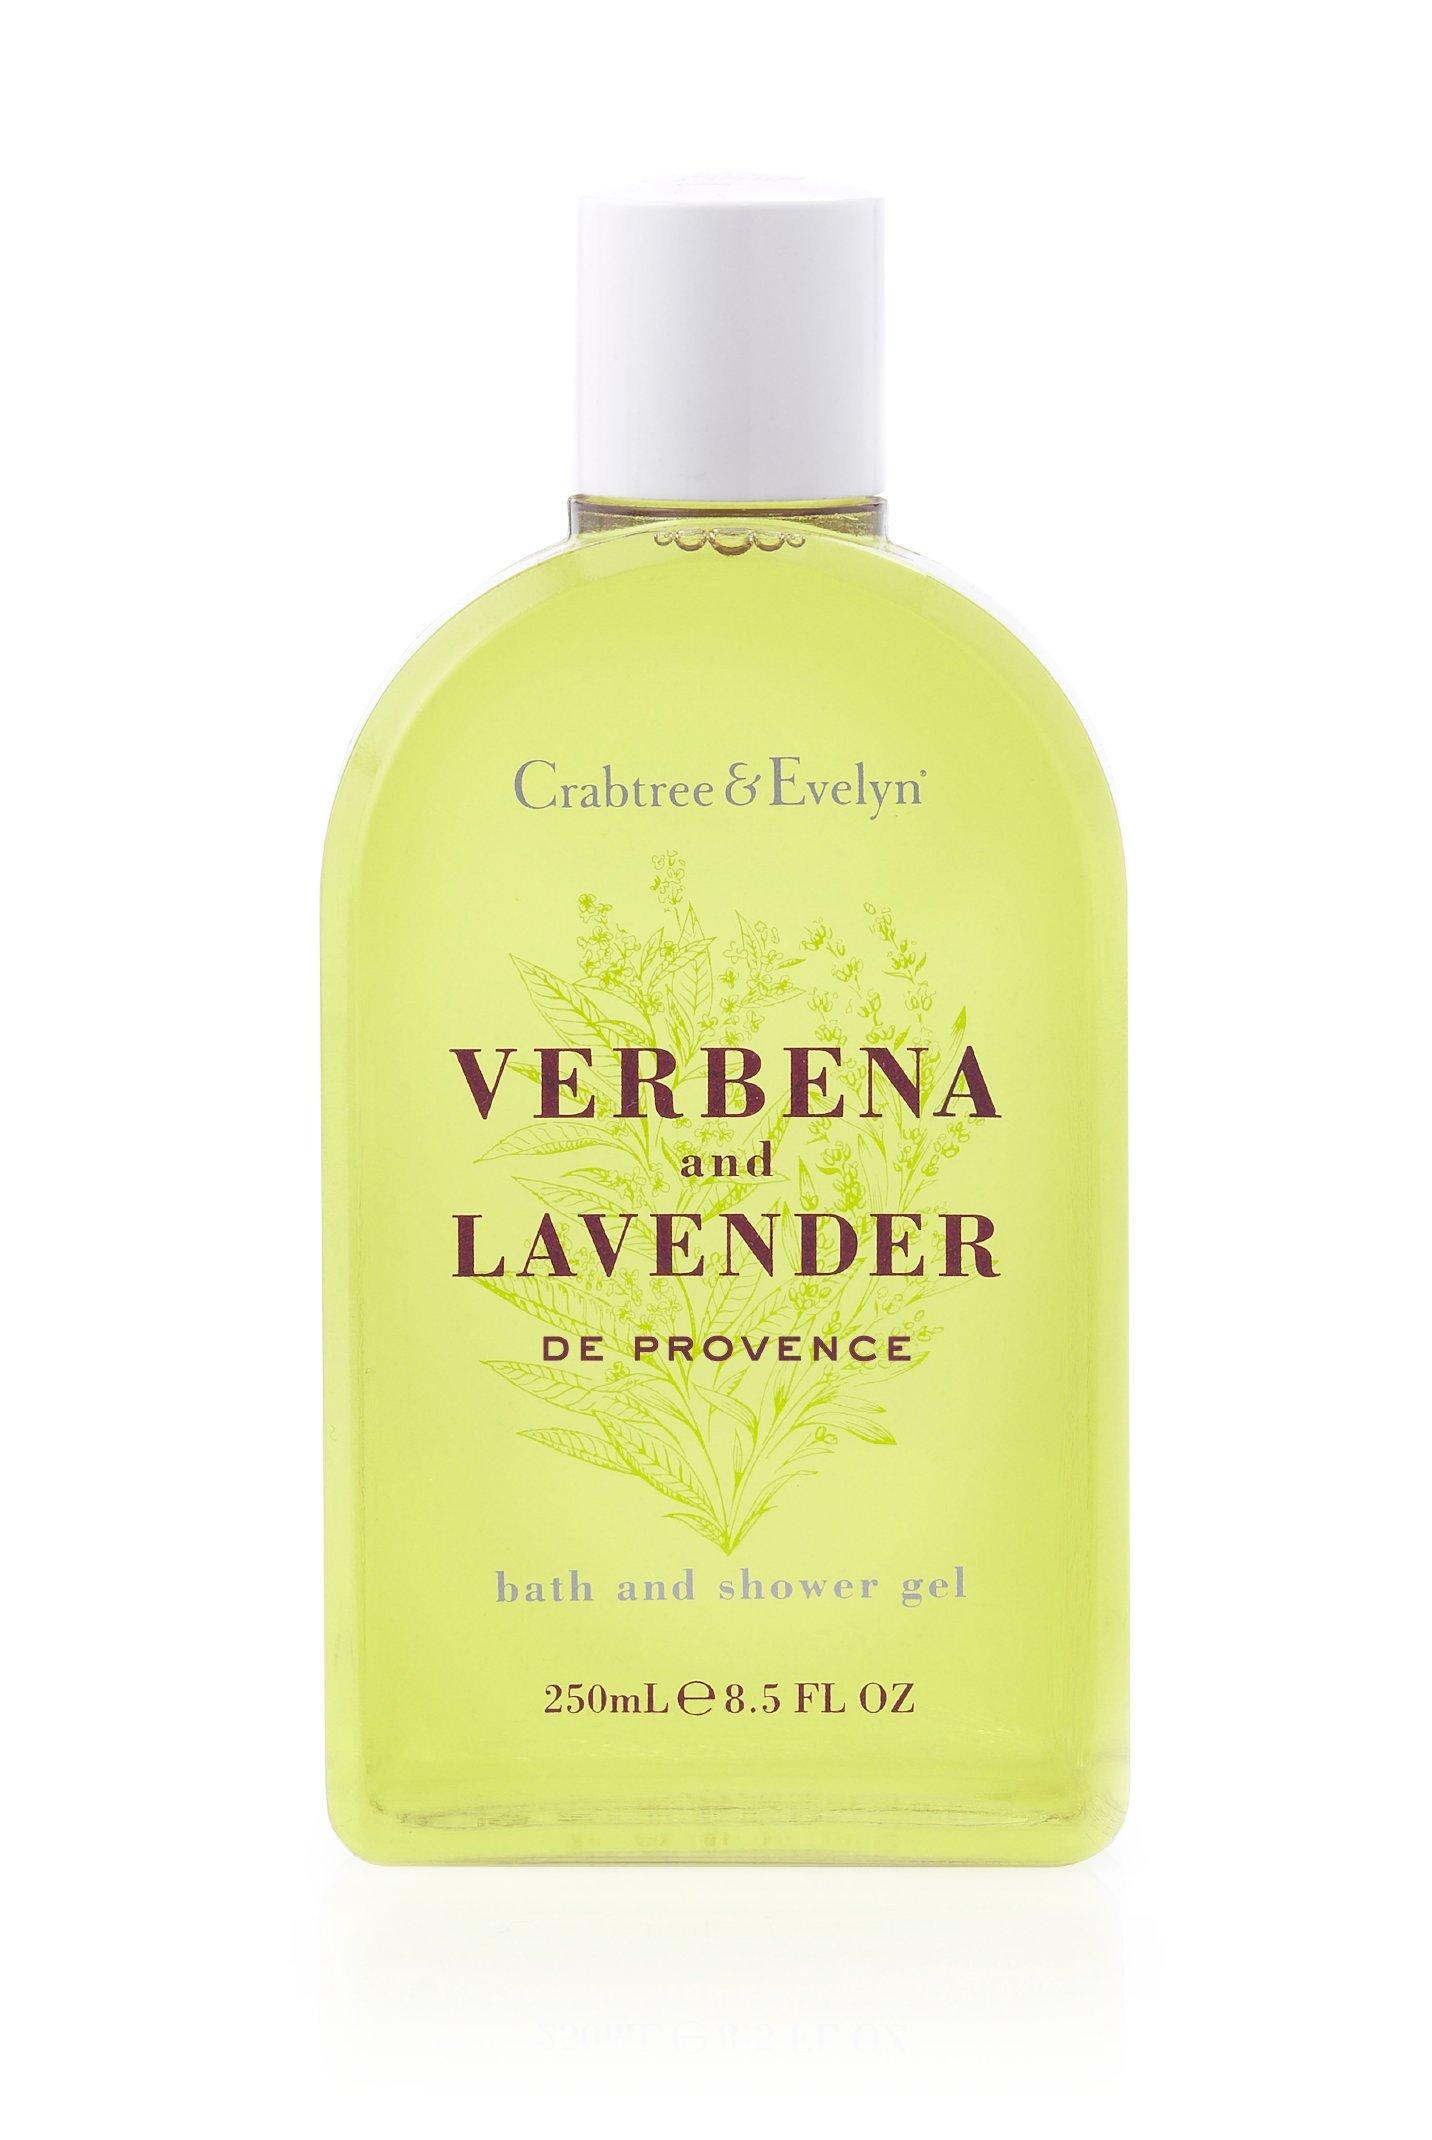 Crabtree Evelyn Daily Moisturising Conditioner Parfum Riject Bath And Shower Gel